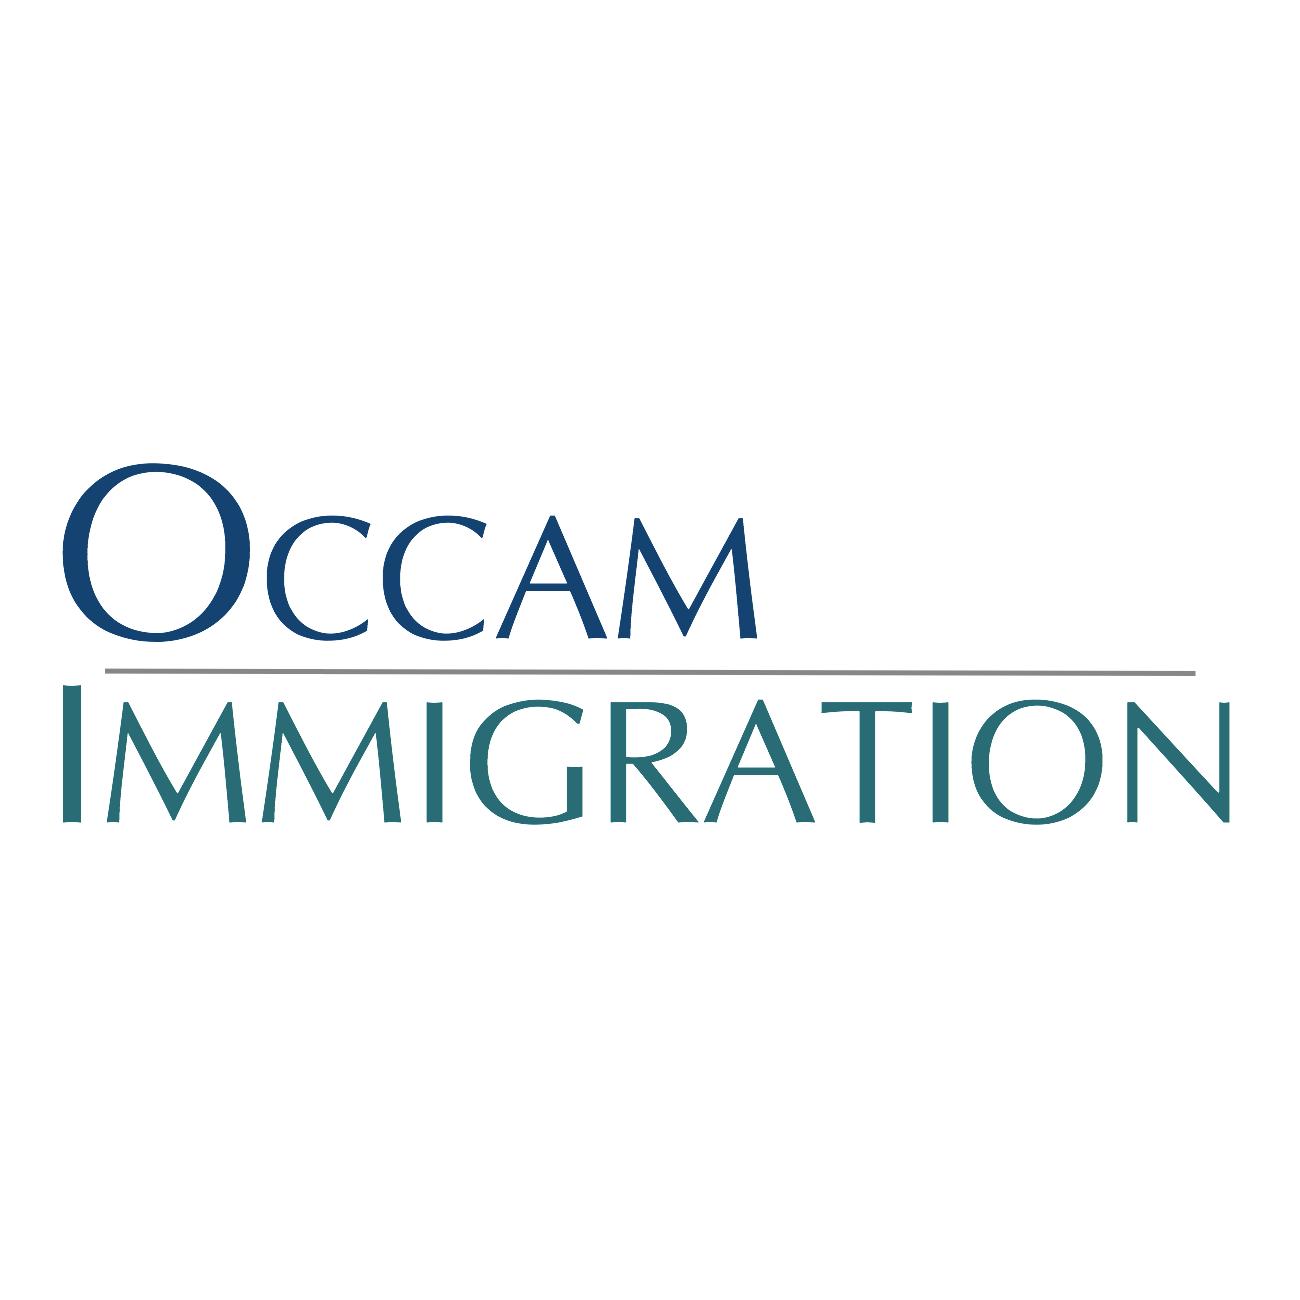 Occam Immigration